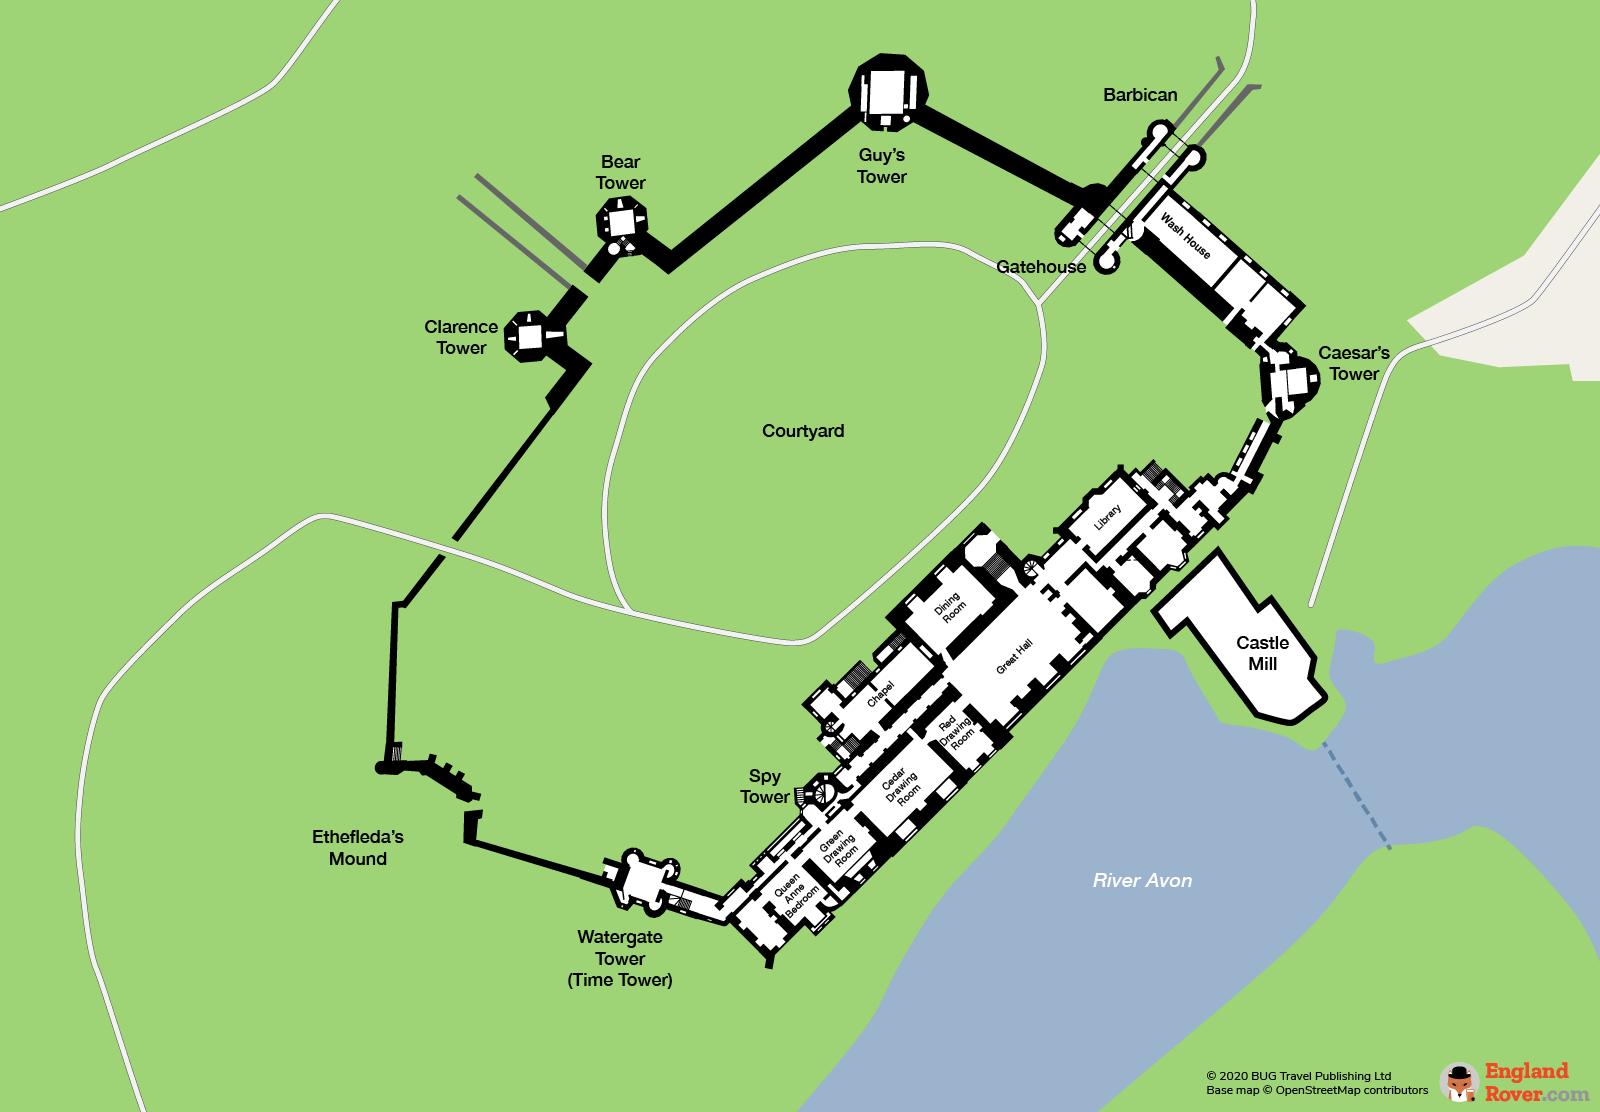 Map and floor plan of Warwick Castle